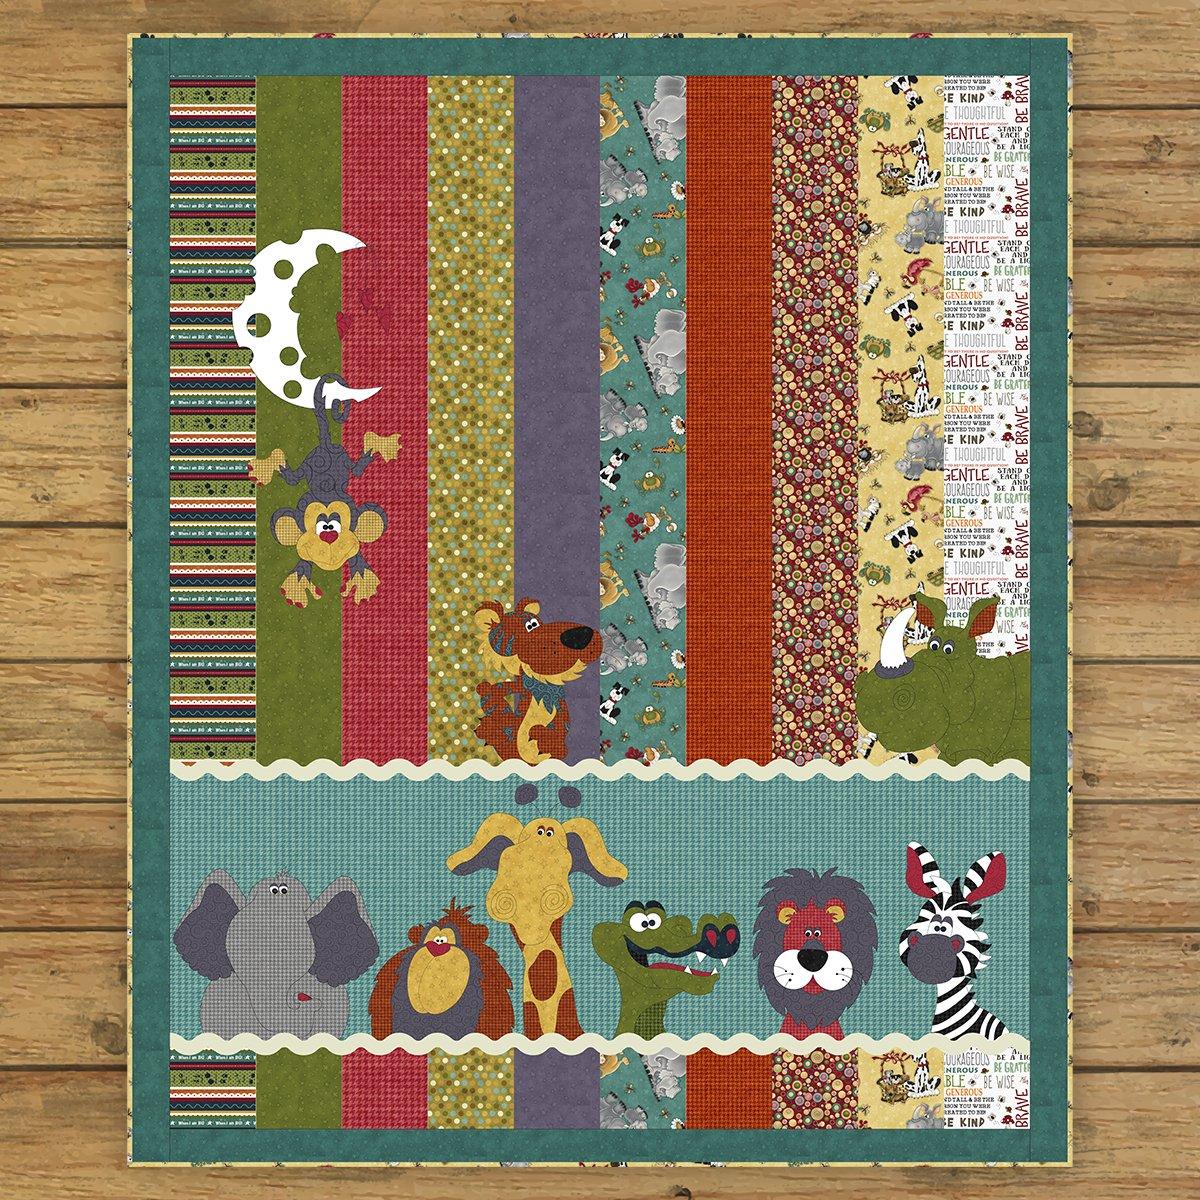 Moon & Back Critter Quilt Precut Applique Pack